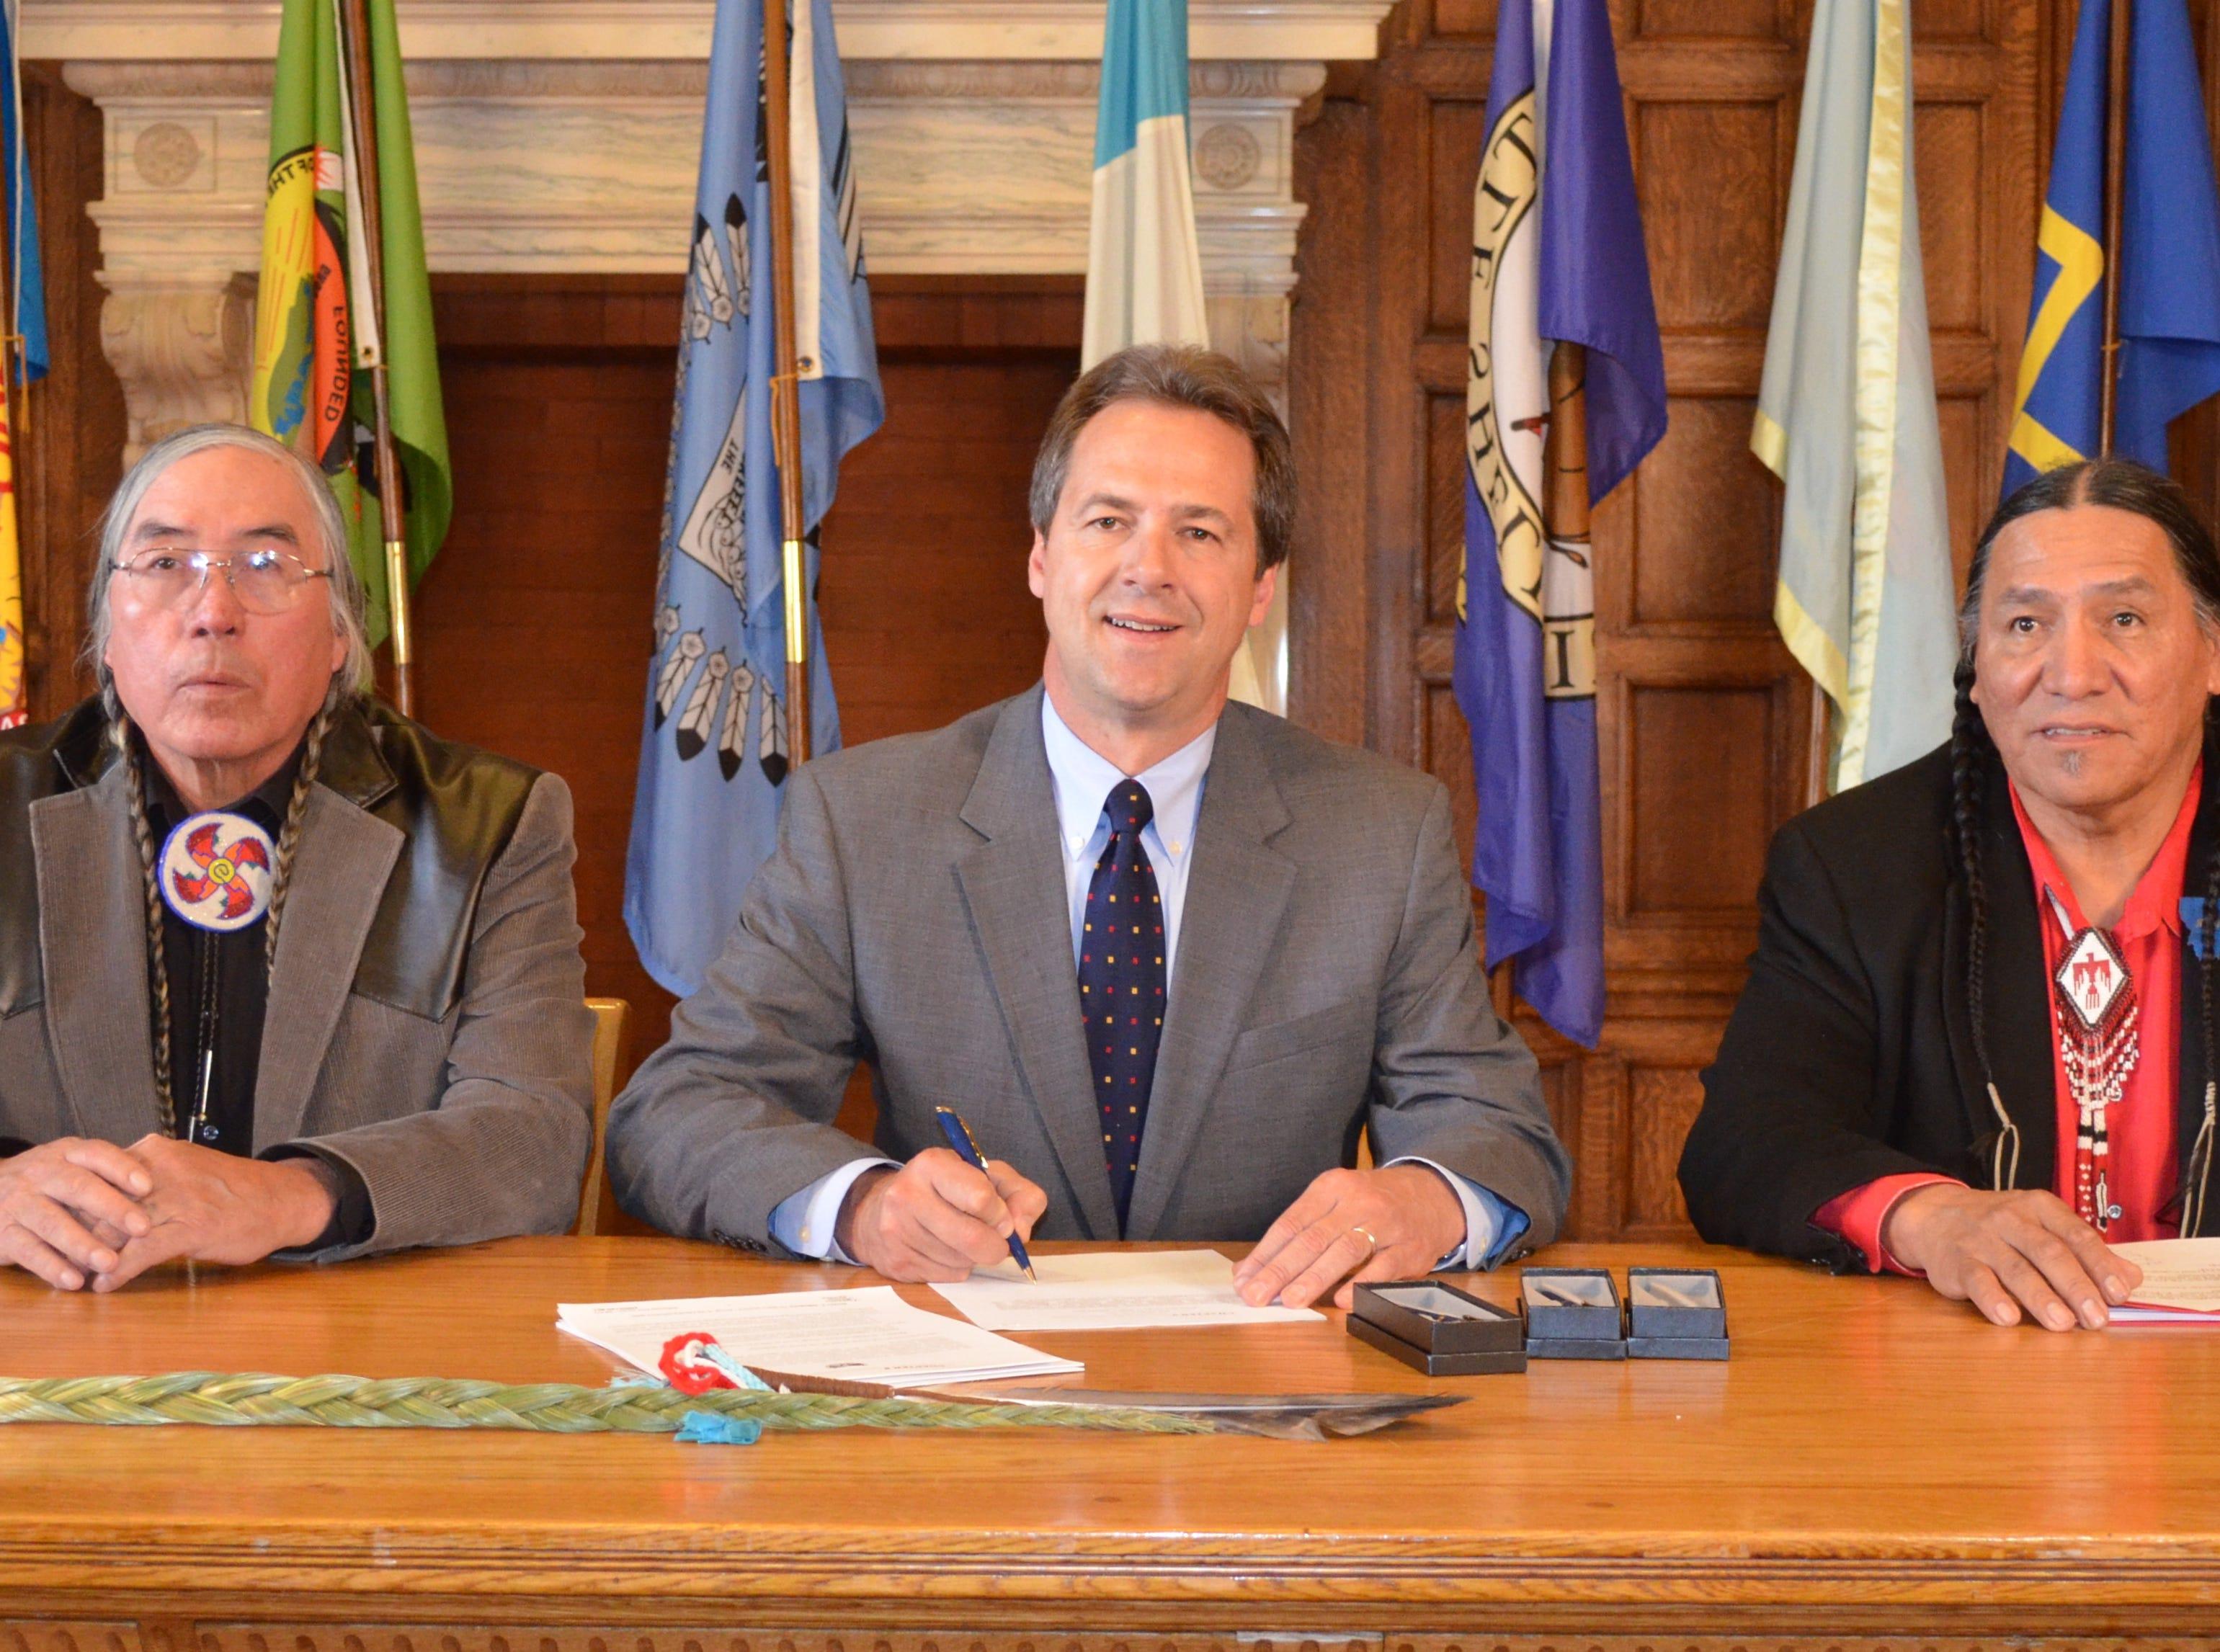 MONTANA STATE PHOTO Rep. George Kipp, D-Heart Butte, Gov. Steve Bullock and Sen. Jonathan Windy Boy, D-Box Elder, at the signing of Kipp and Windy Boy?s Indian language bills.